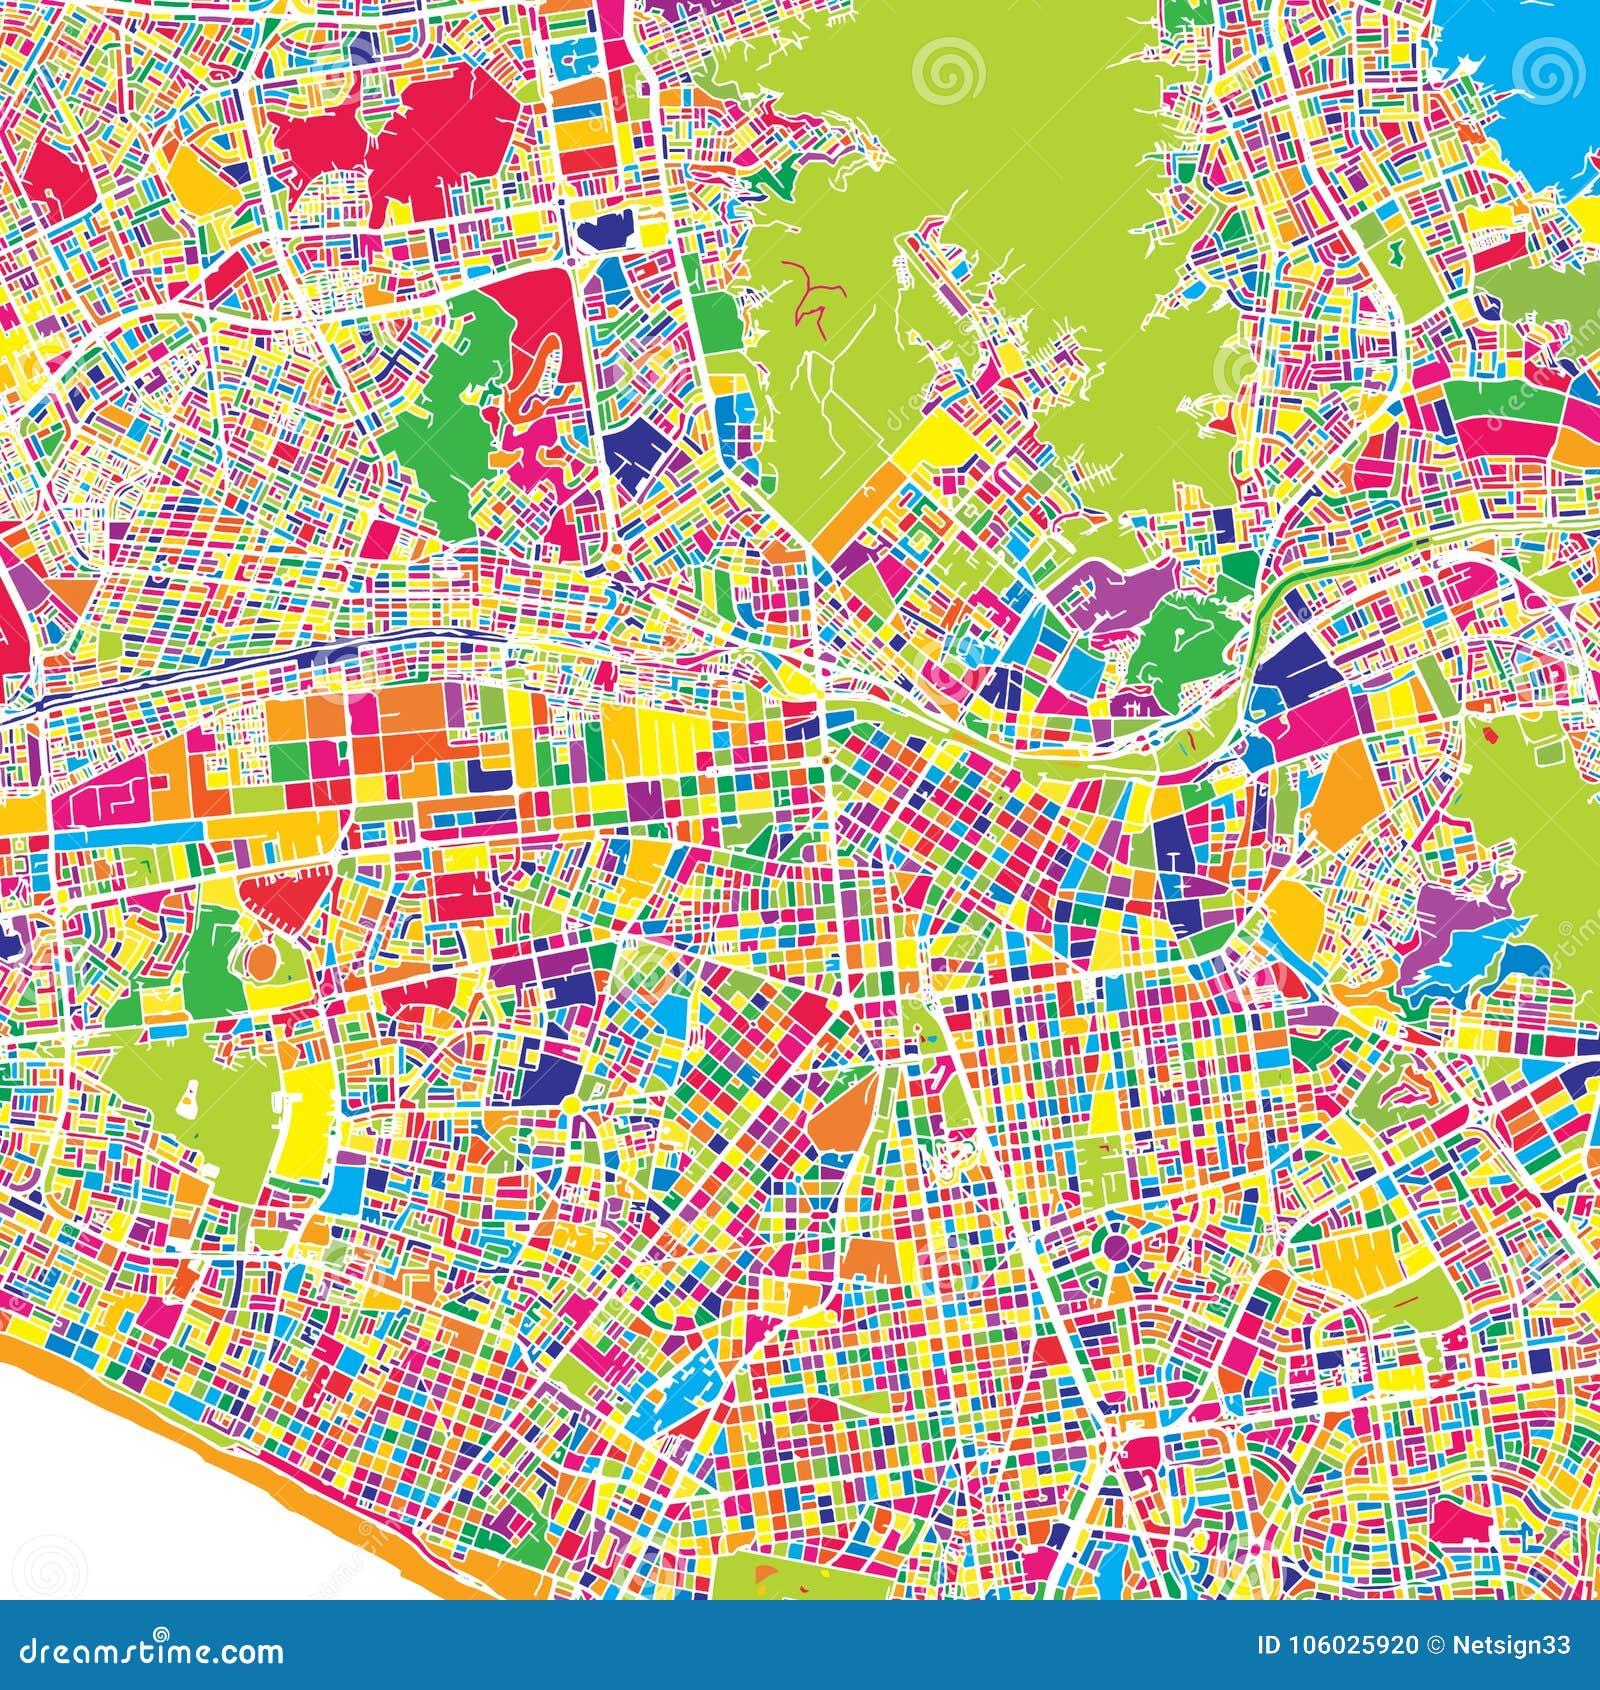 Lima, Lima District, Peru, kleurrijke vectorkaart